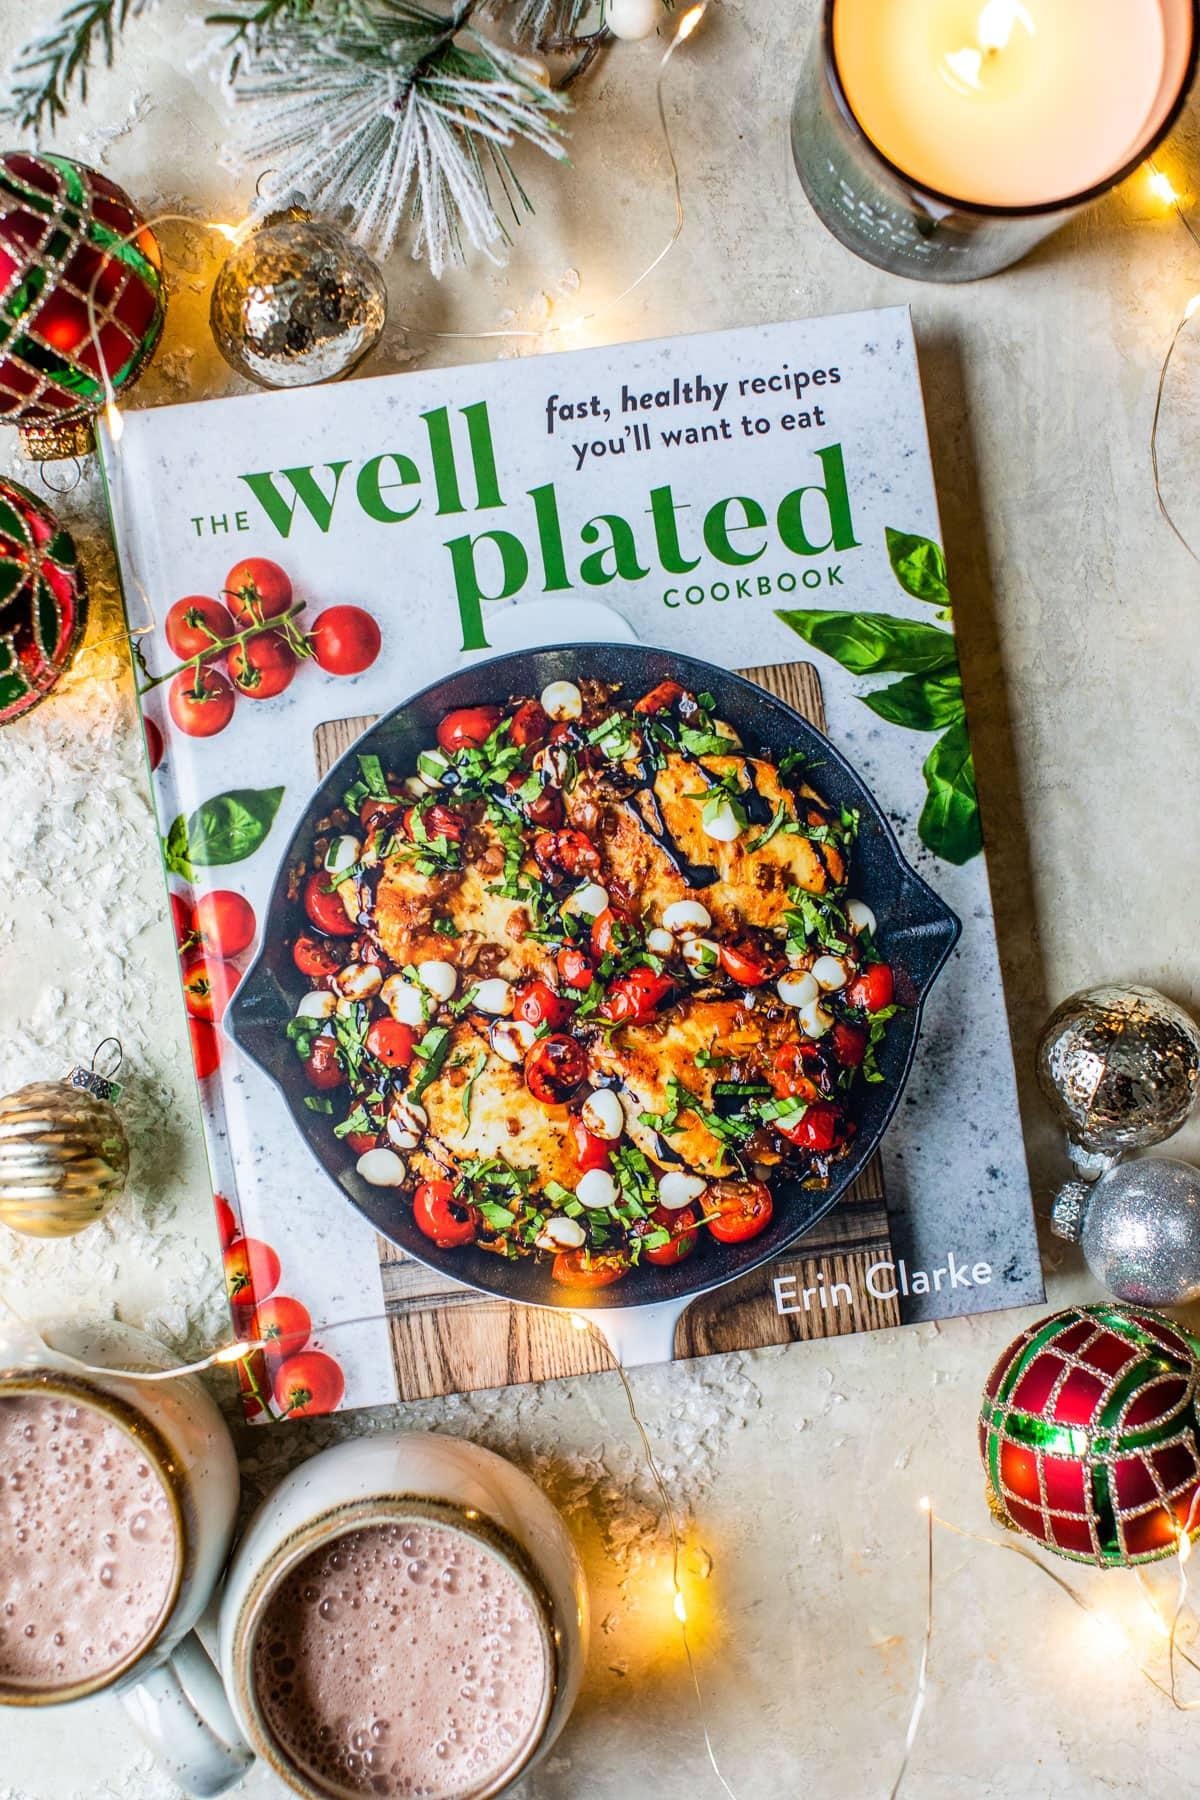 Guía de entretenimiento navideño Libro de cocina bien decorado con decoración navideña